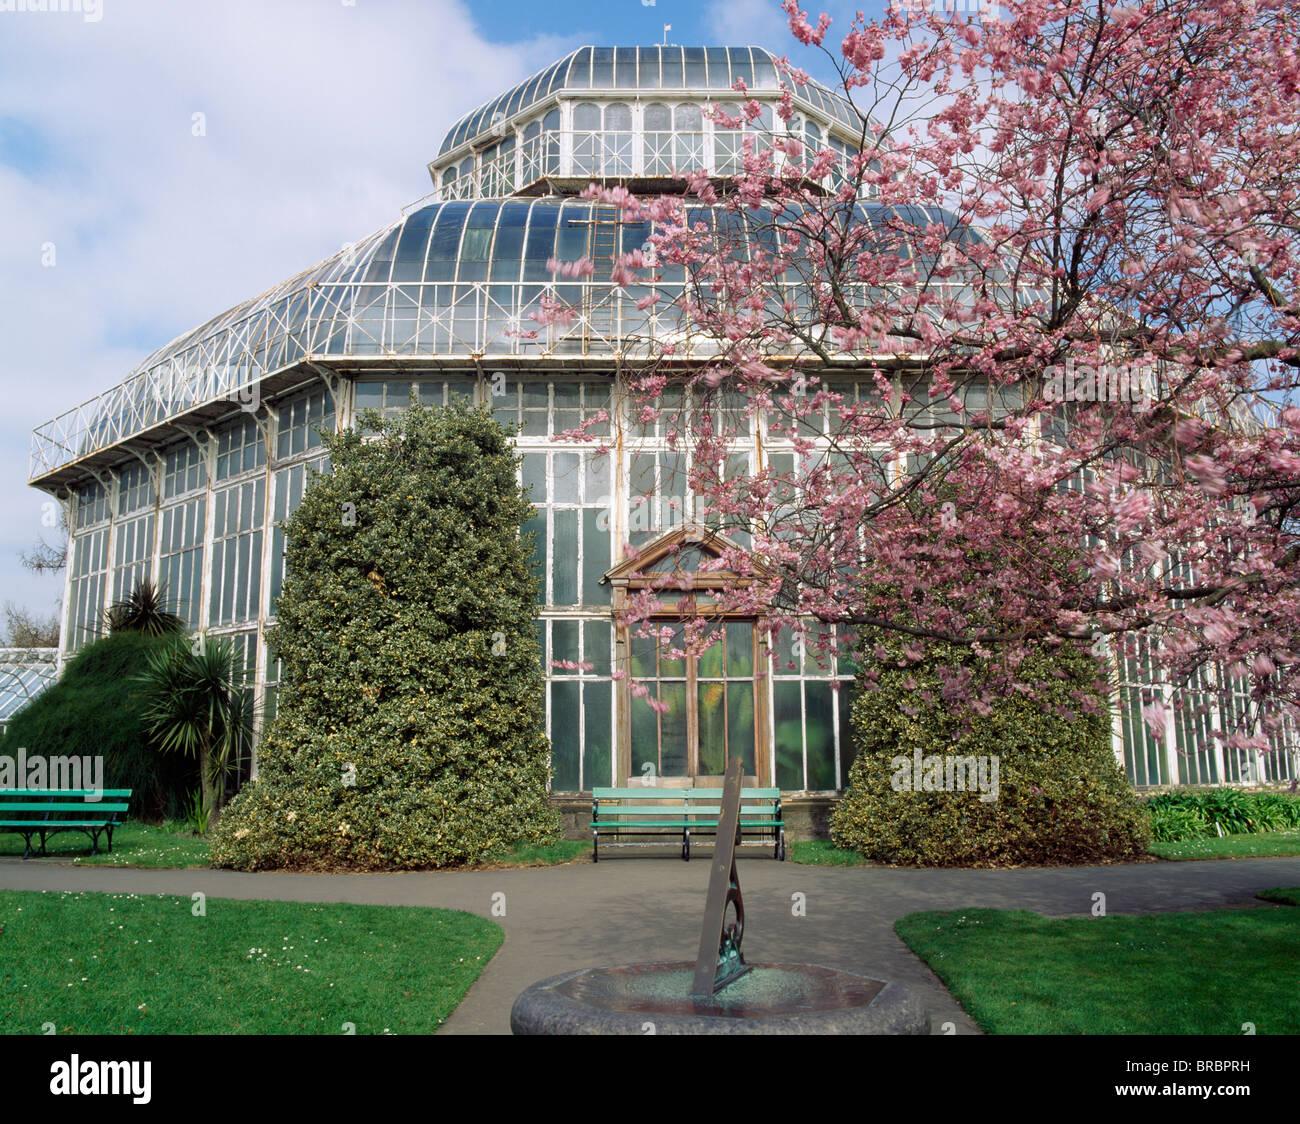 Palm House, National Botanic Gardens, Glasnevin, County Dublin, Ireland    Stock Image